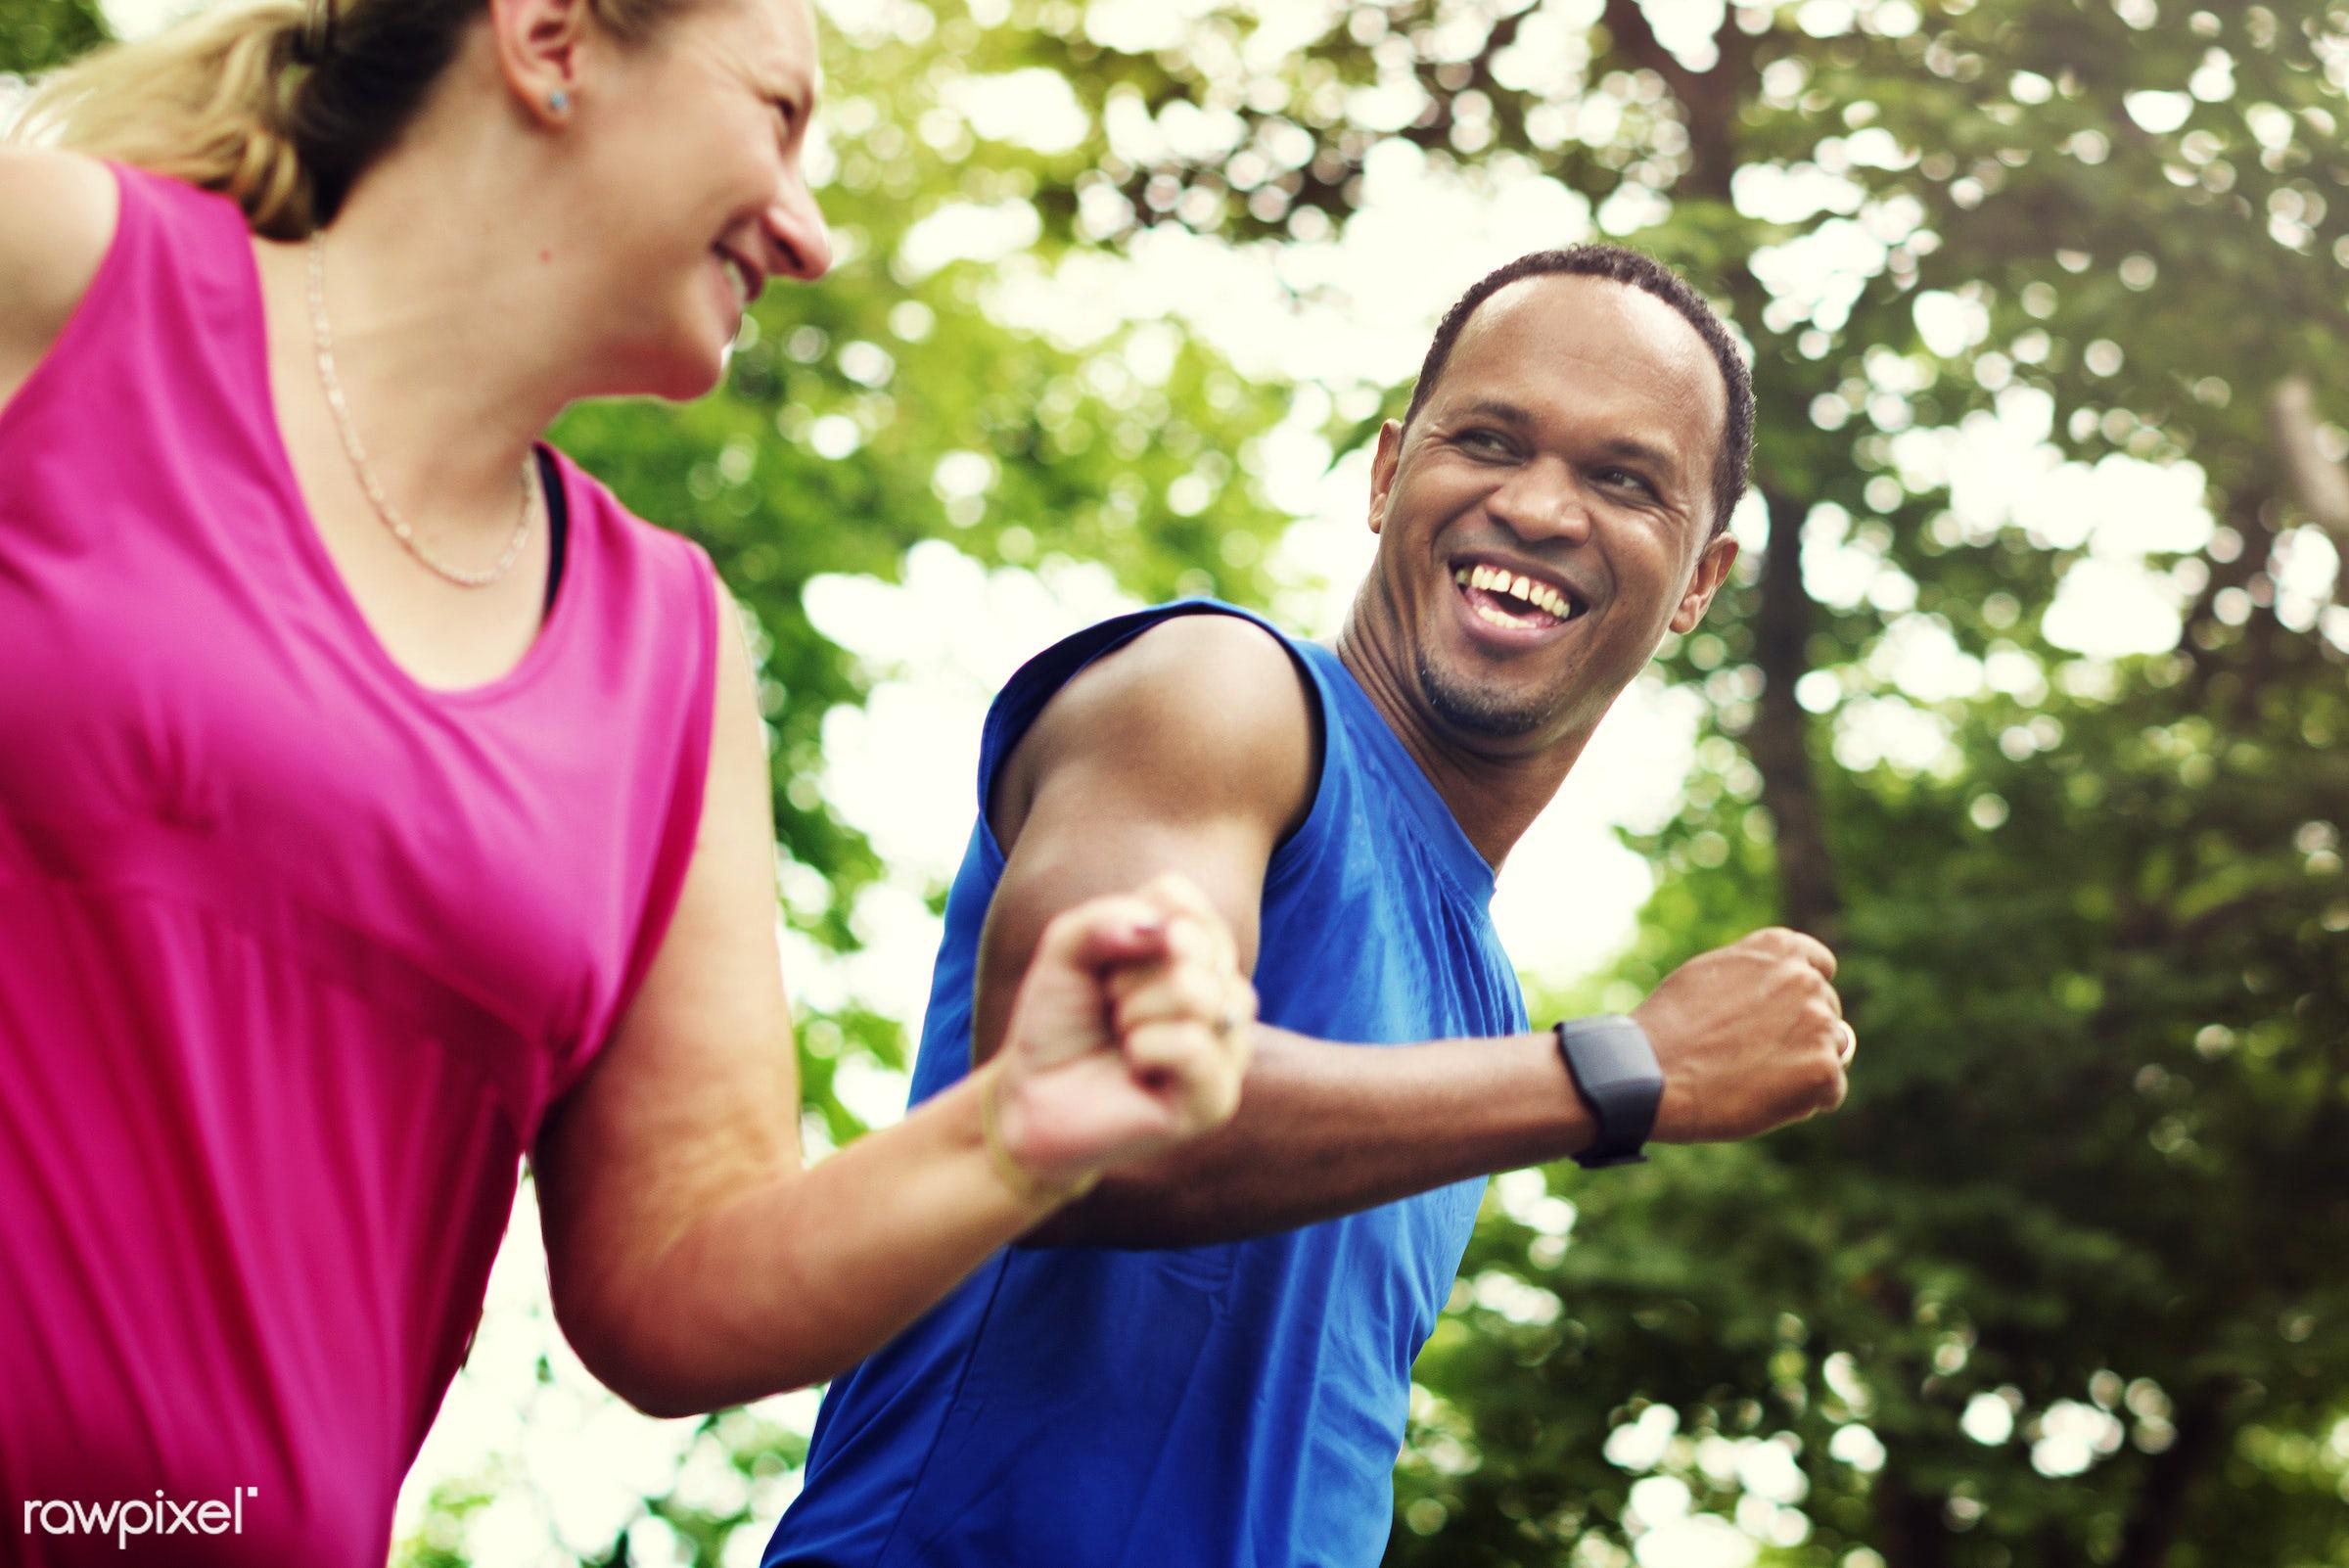 active, athletic, boyfriend, cheerful, coach, couple, enjoyment, exercise, fit, fitness, friends, friendship, girlfriend,...